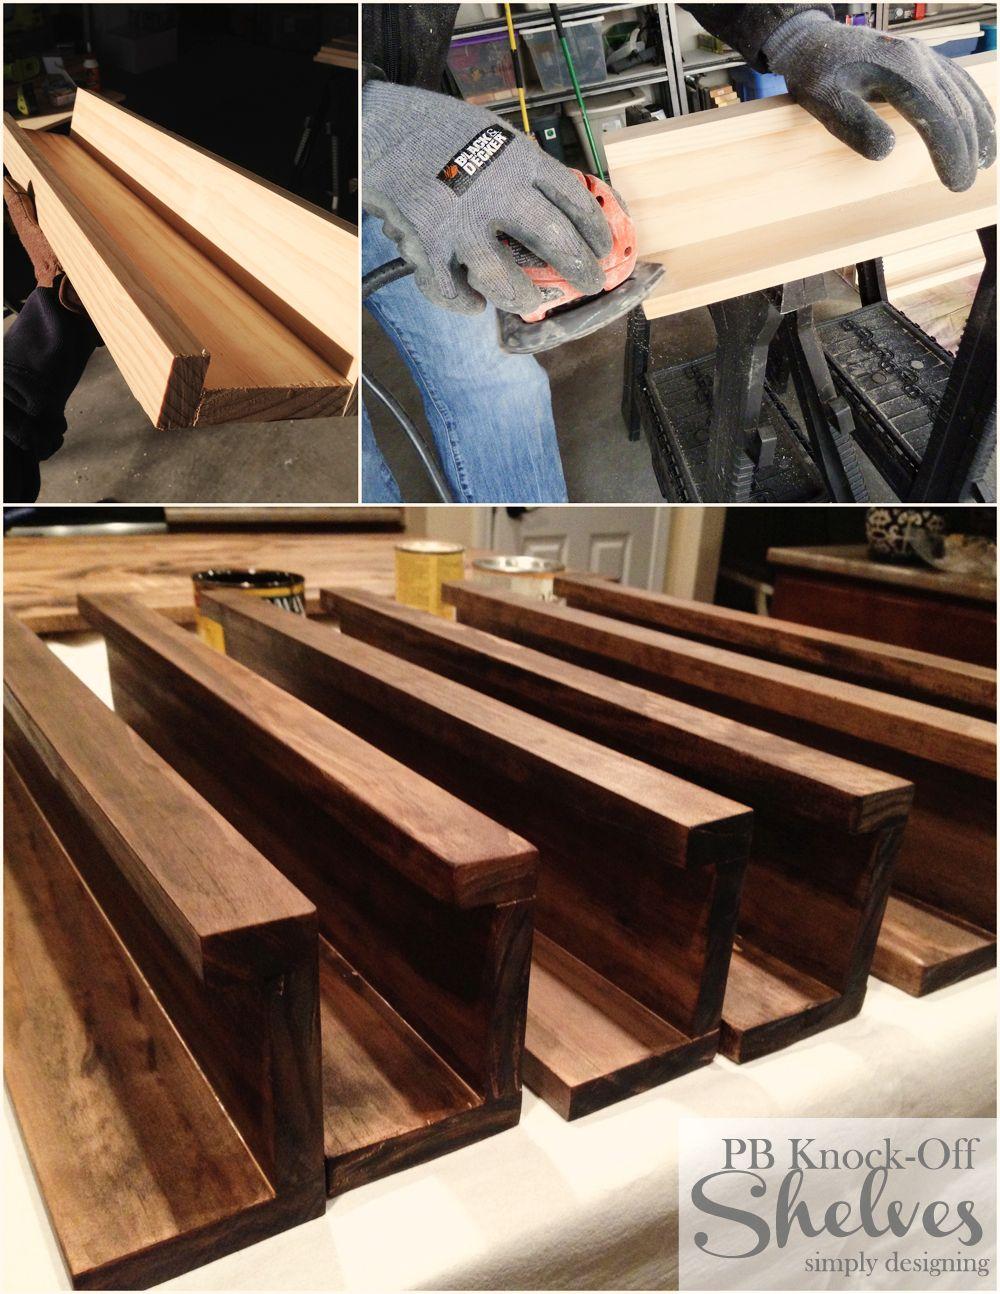 DIY Shelves how to make knockoff shelves with a Kreg